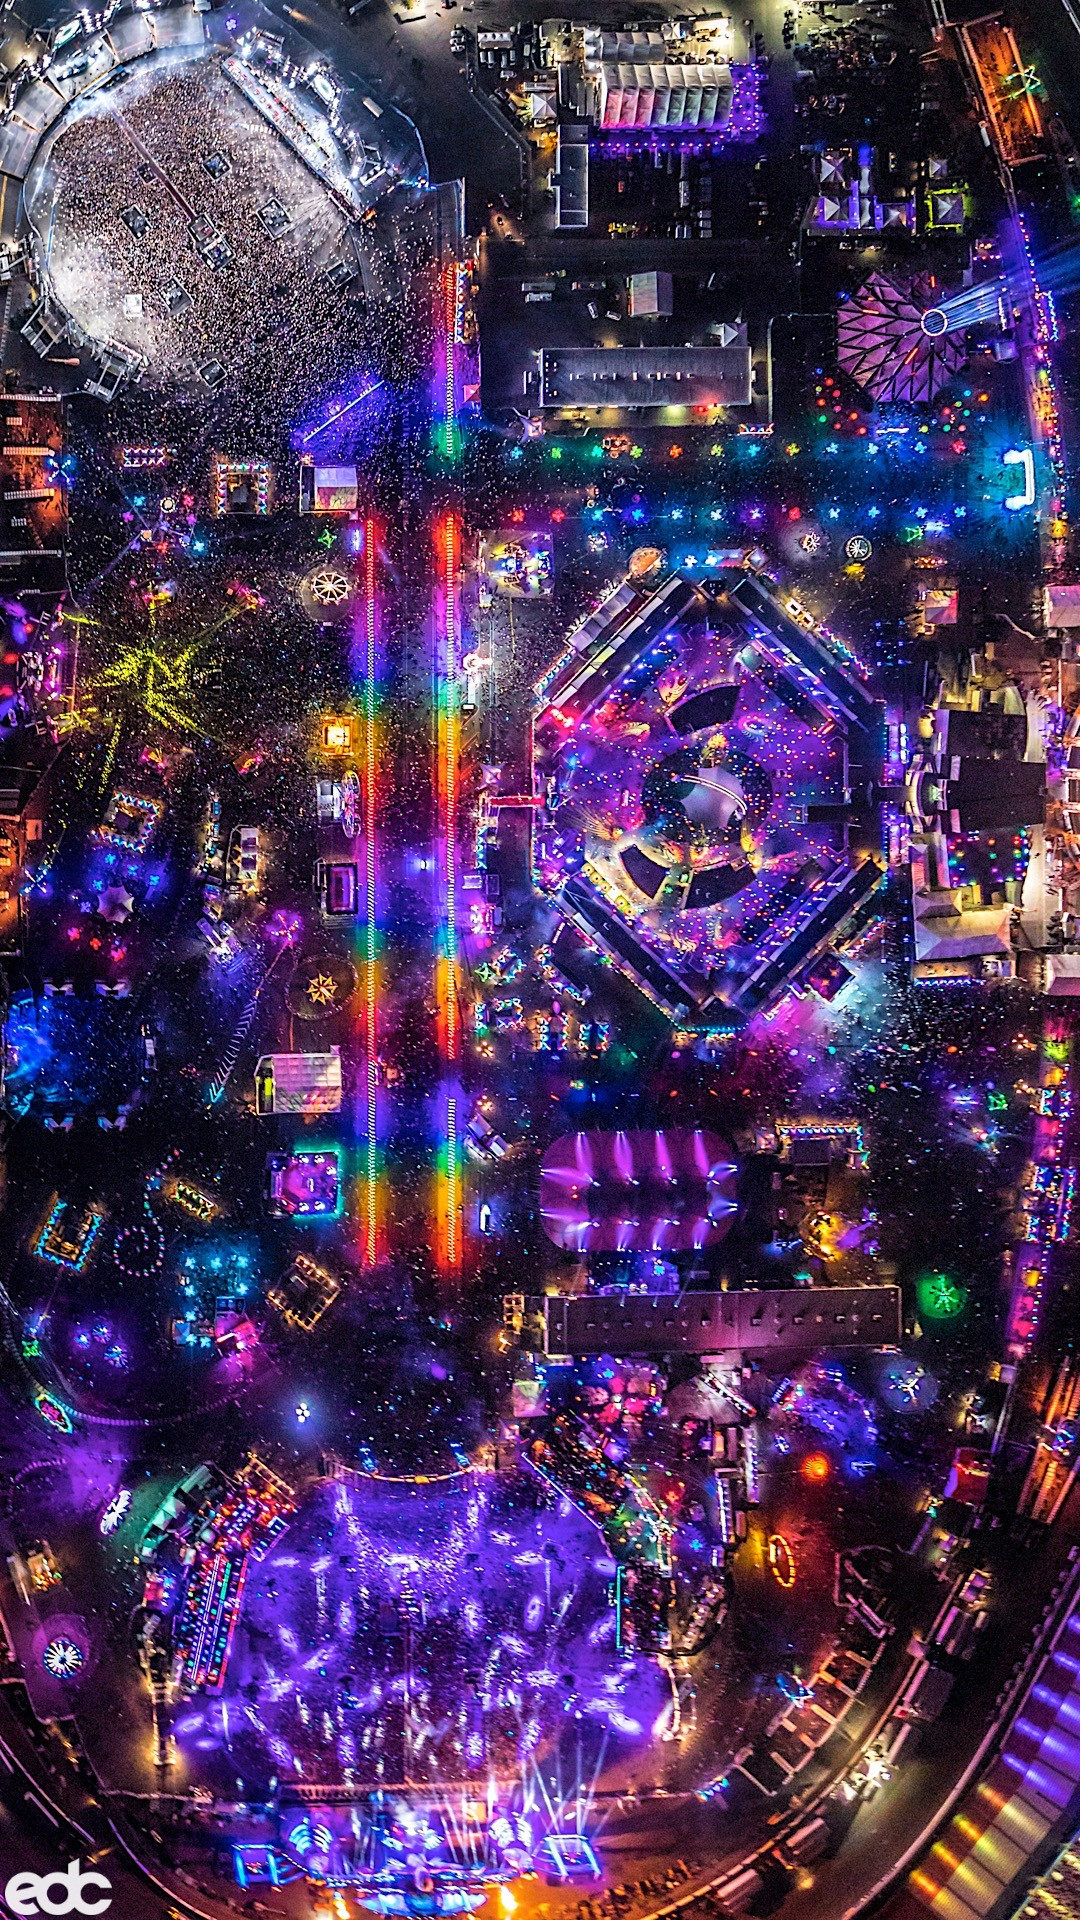 EDC Las Vegas Wallpaper (92+ images)